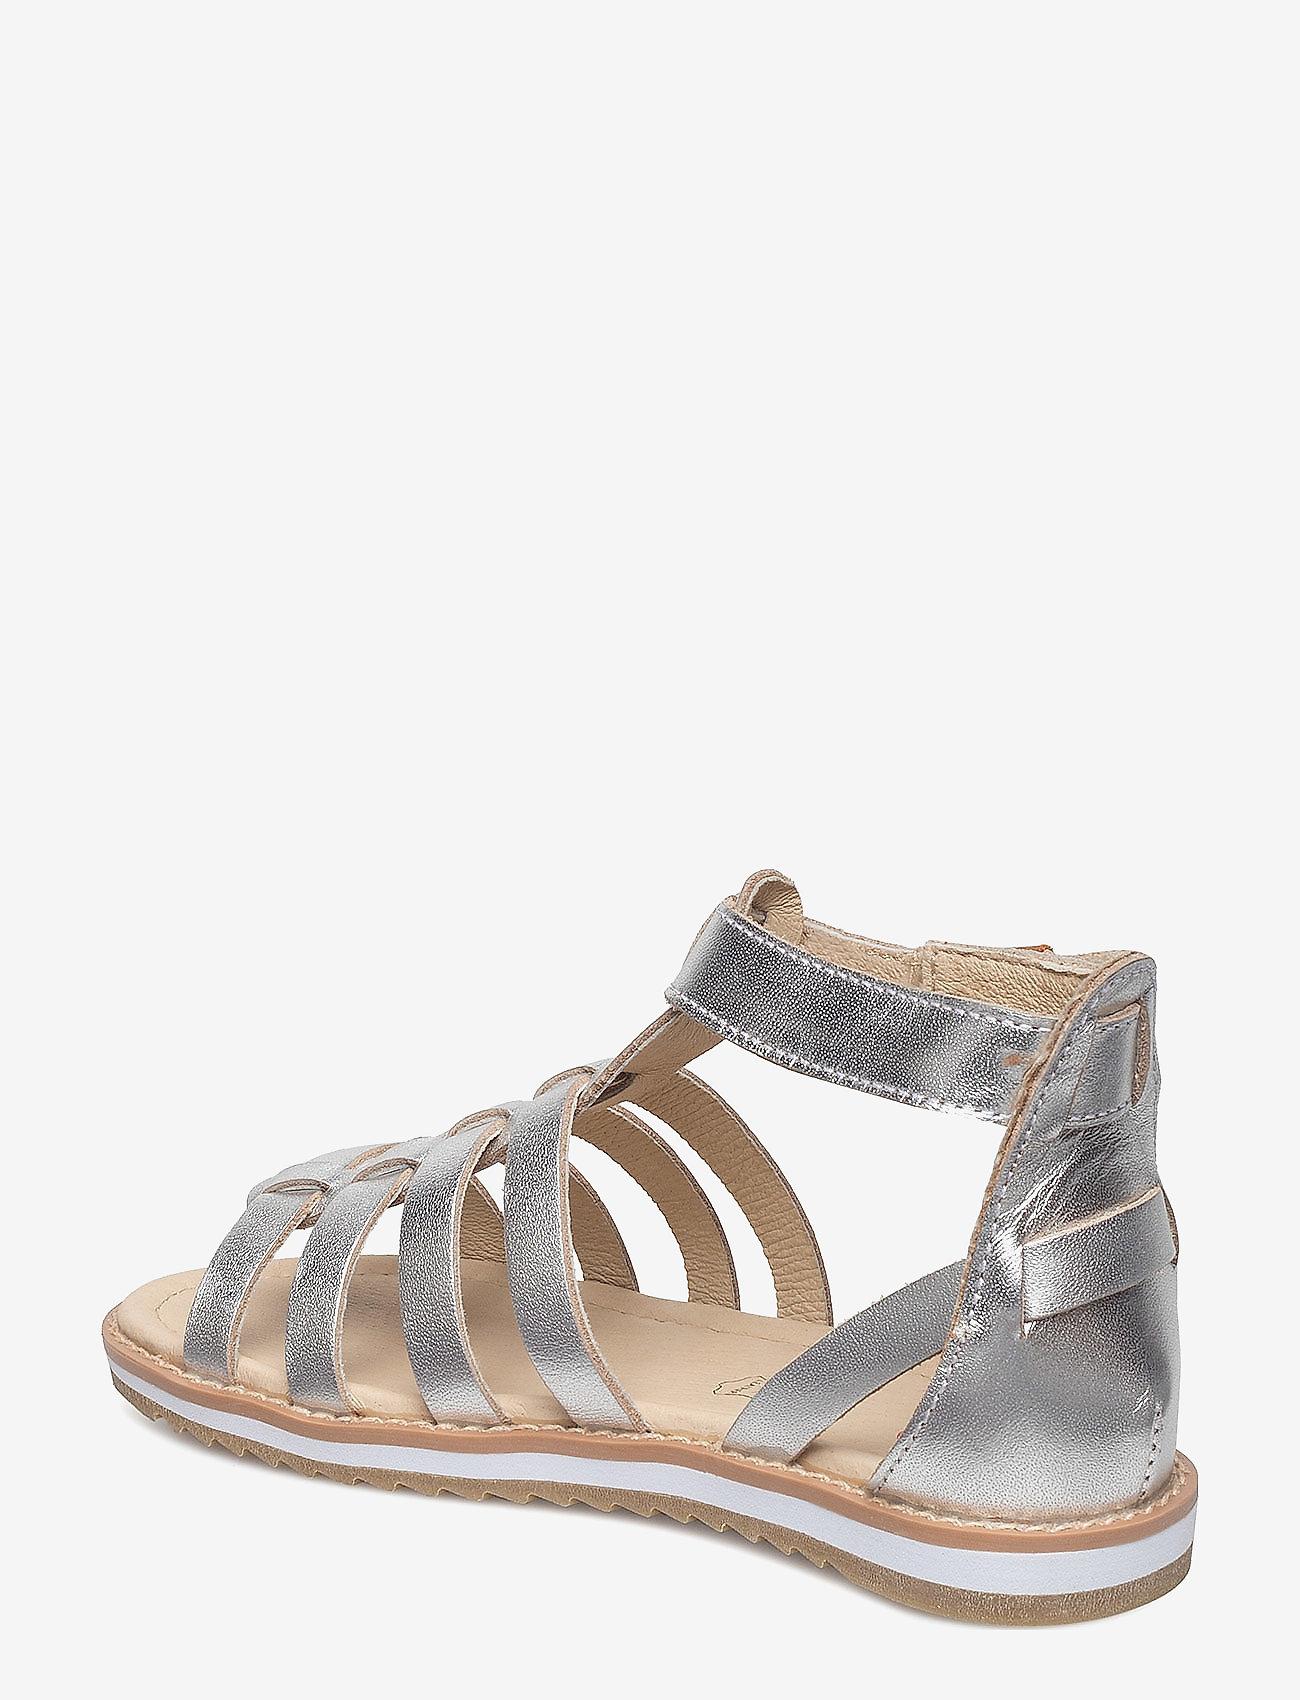 PAX - GUSS - sandals - silver